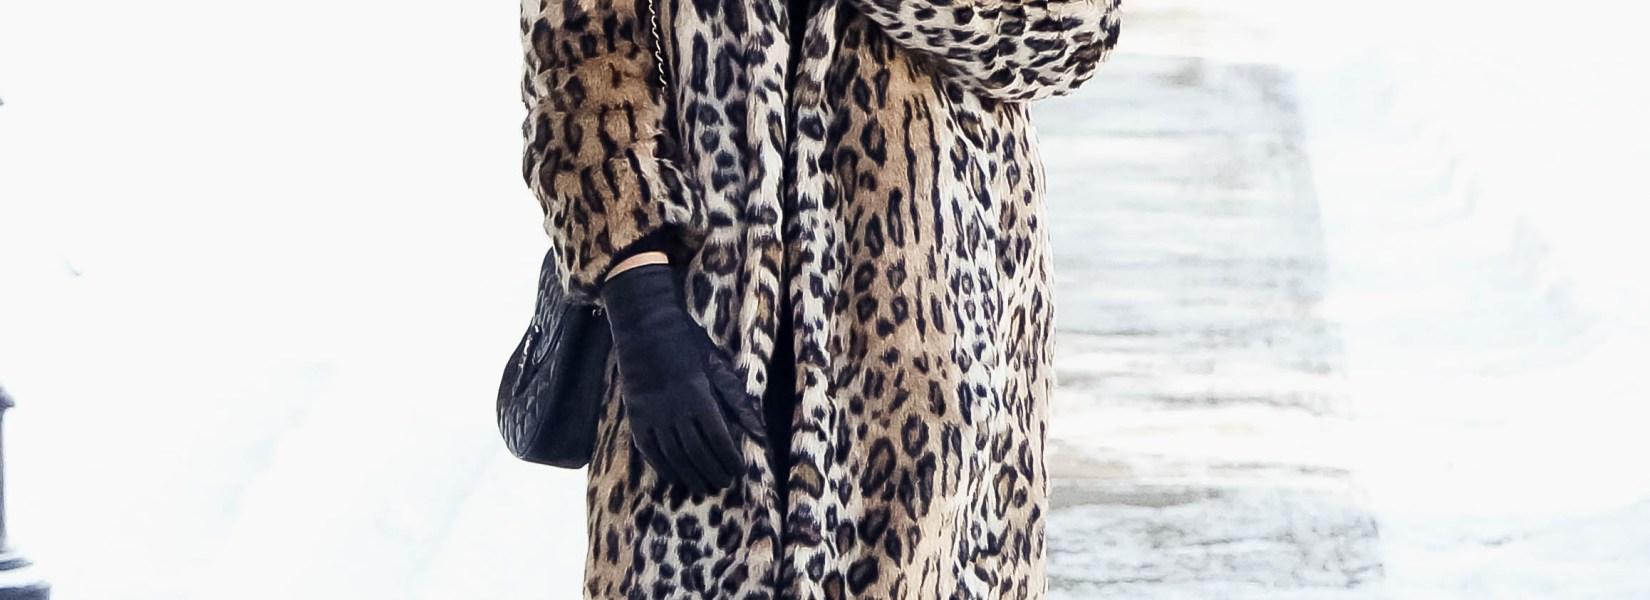 Statement Piece For Winter: Leopard Fur Coat